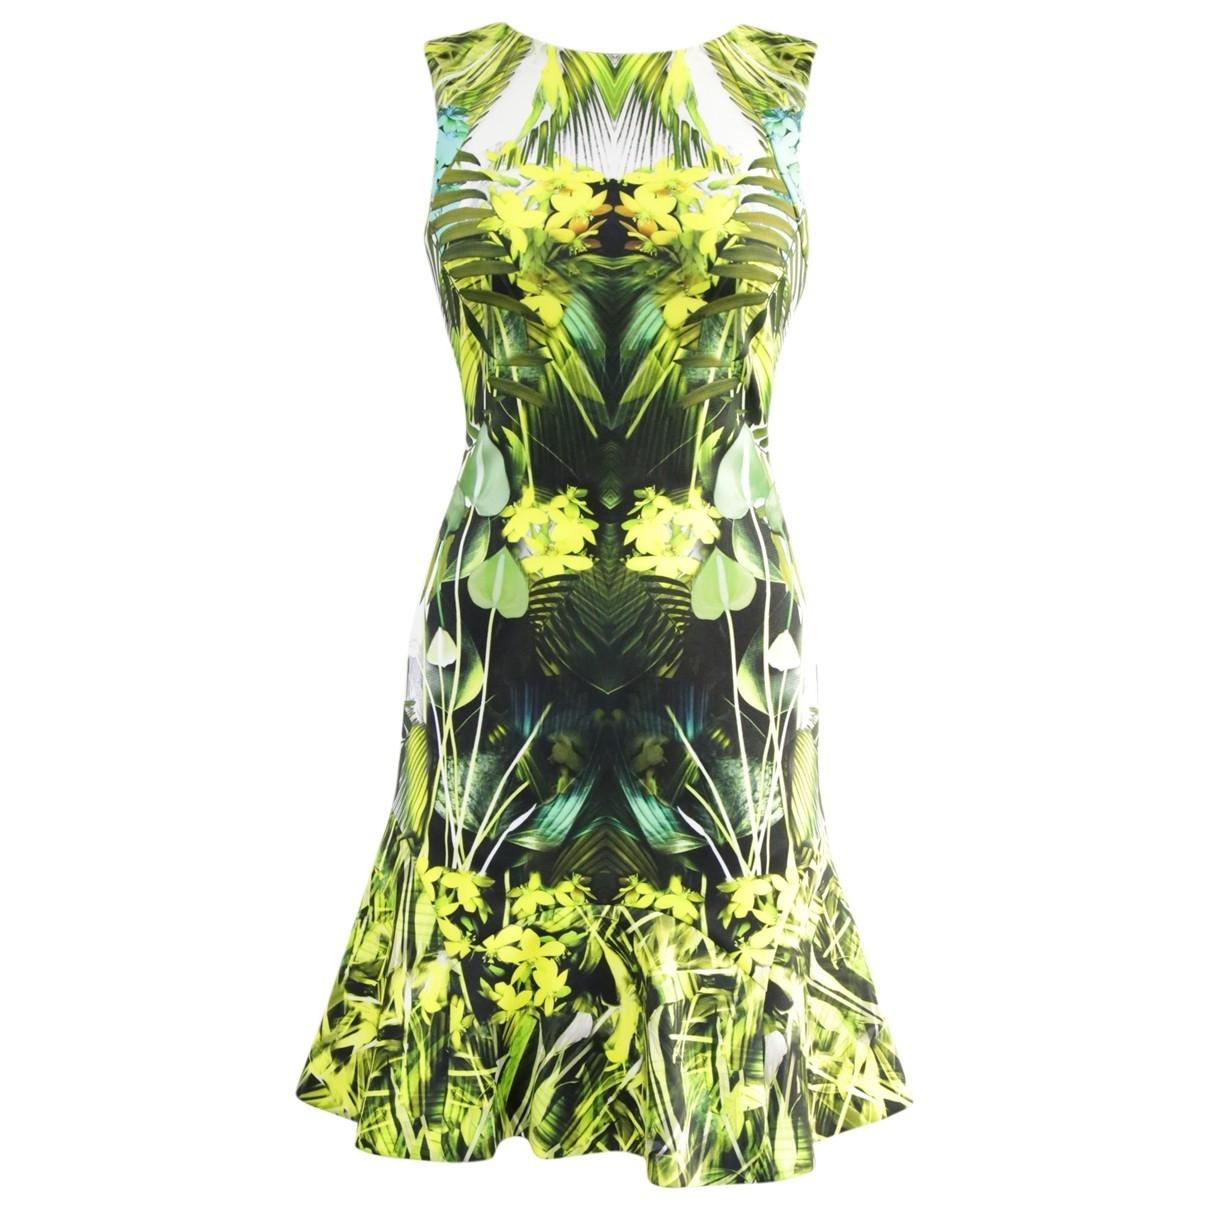 Karen Millen \N Kleid in  Gruen Polyester